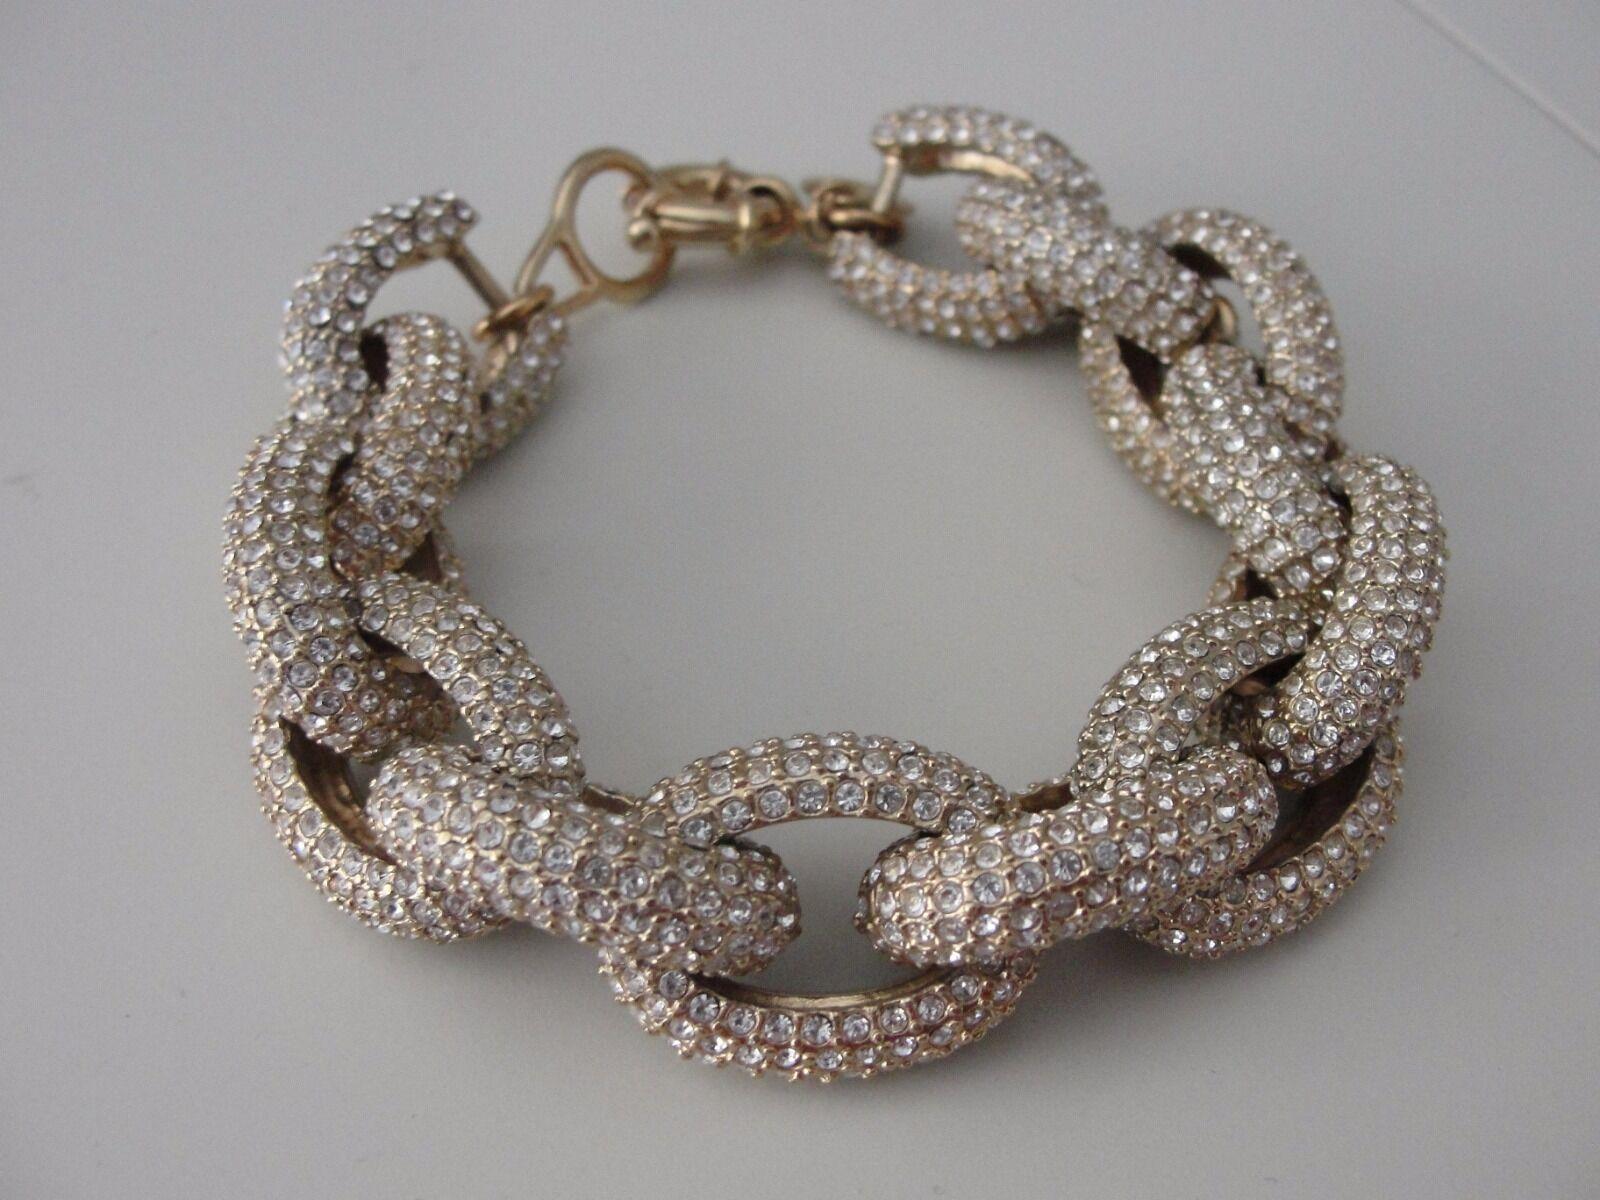 J Crew CLASSIC PAVÉ LINK BRACELET gold Jewelry Statement Rhinestone Blogger  125